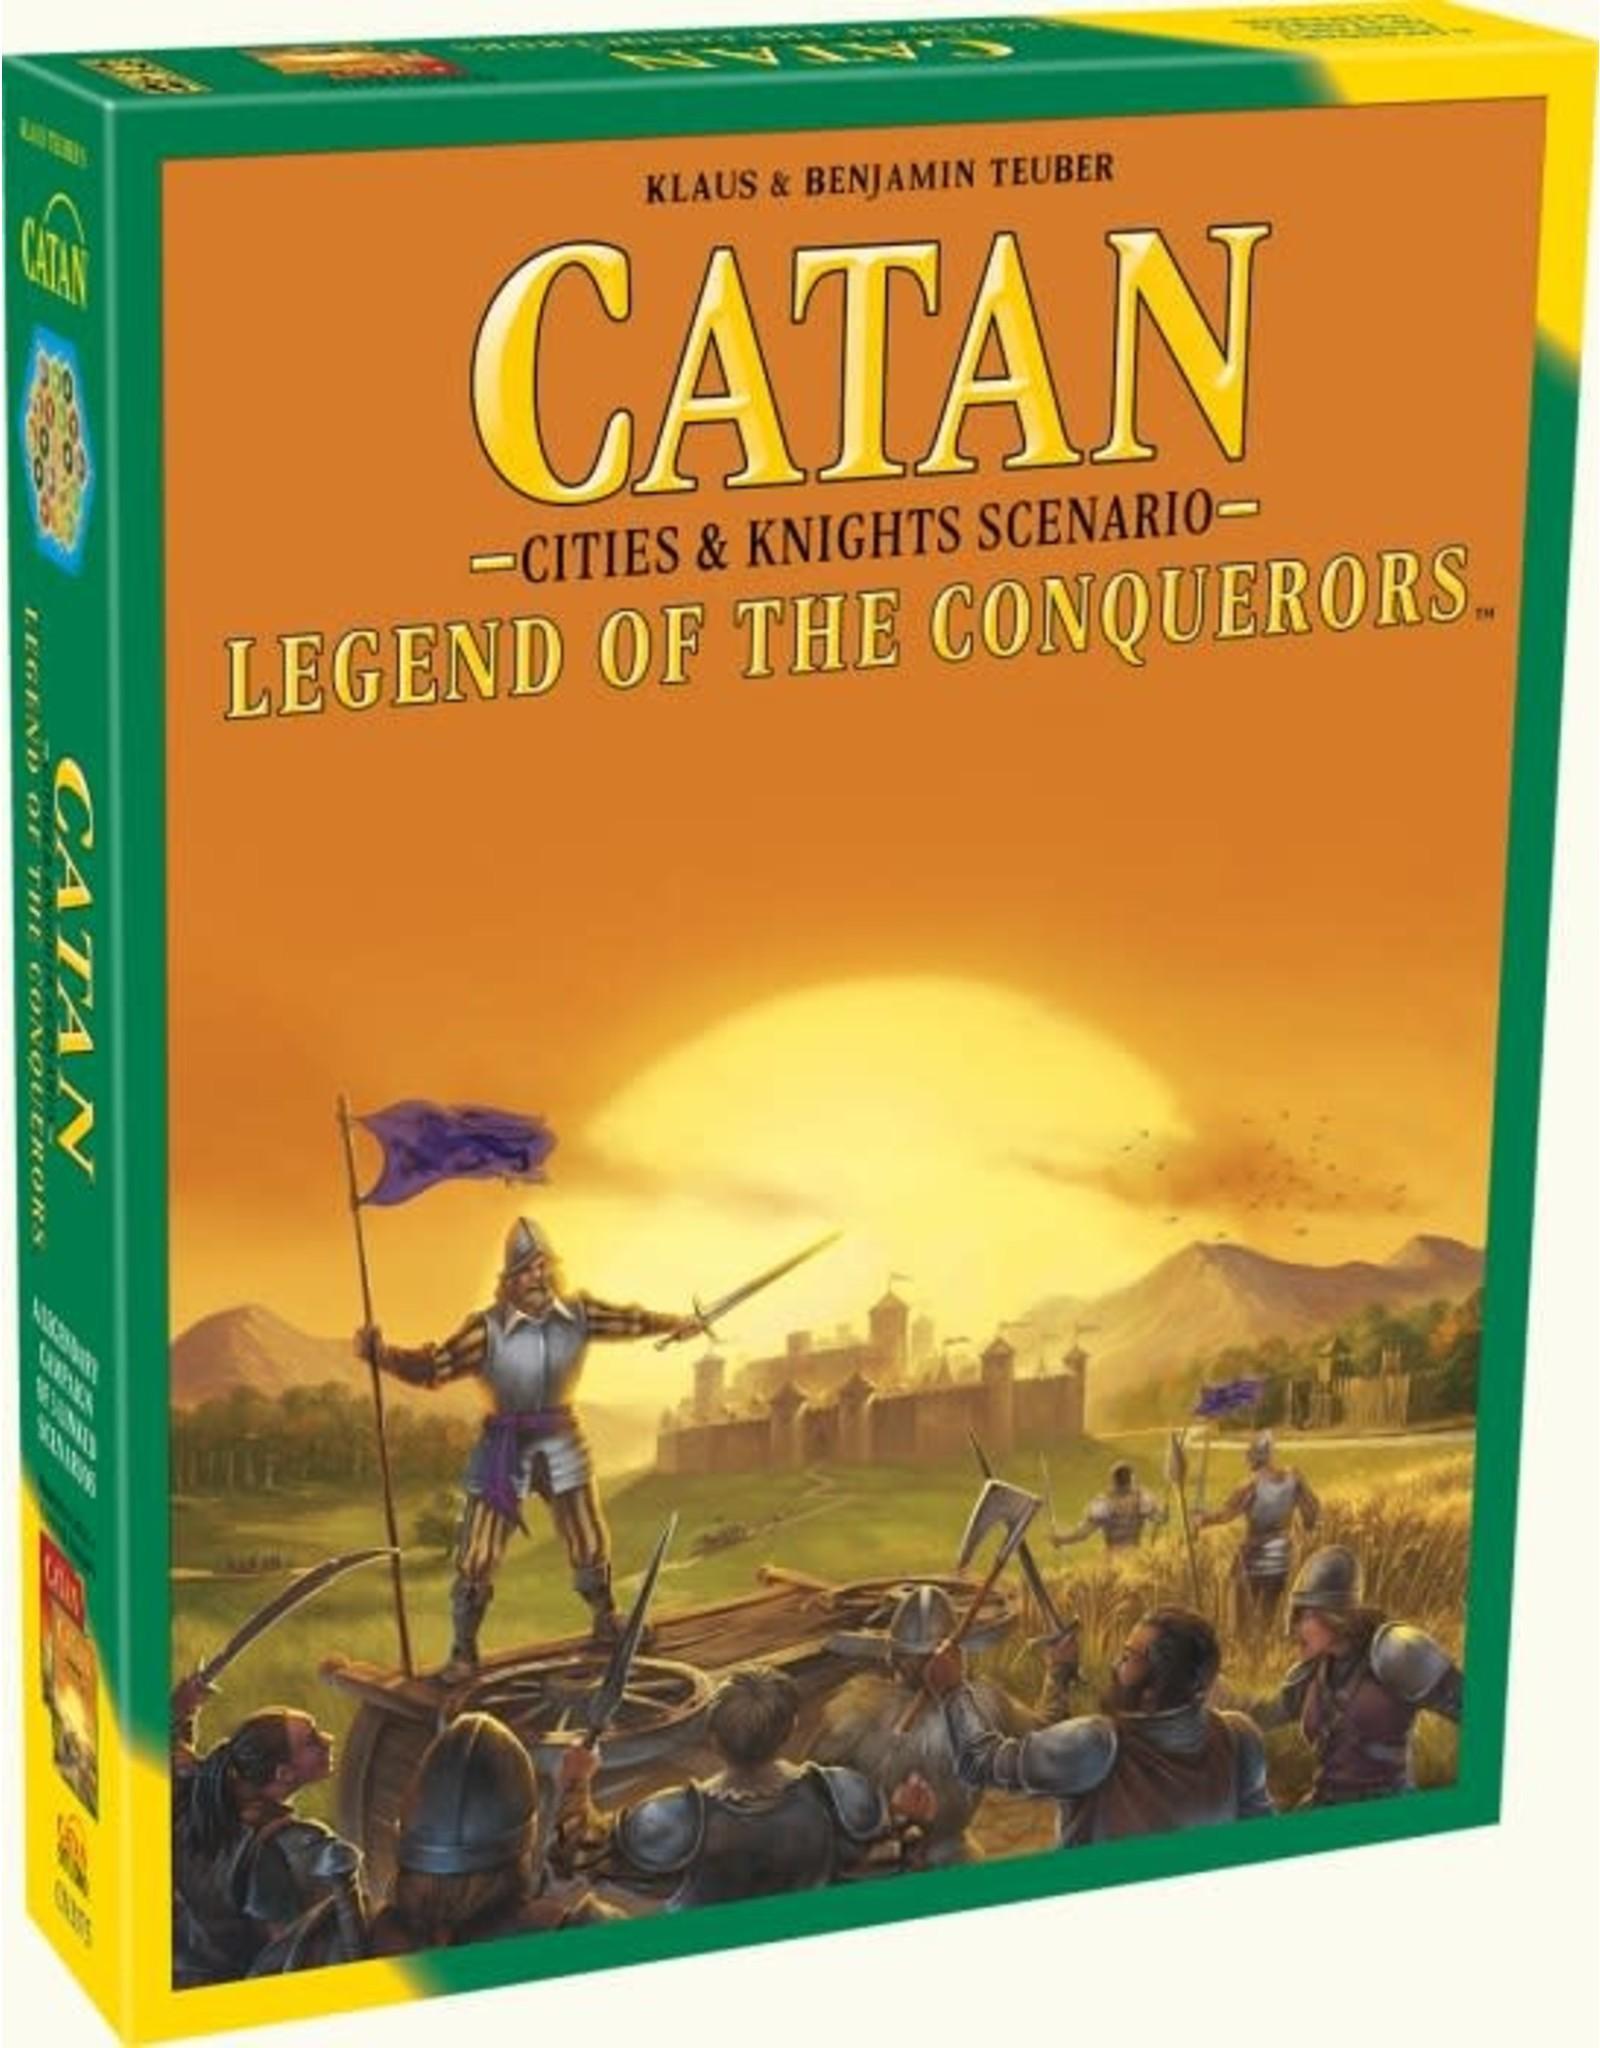 Catan Studio Catan Legend of the Conquerors